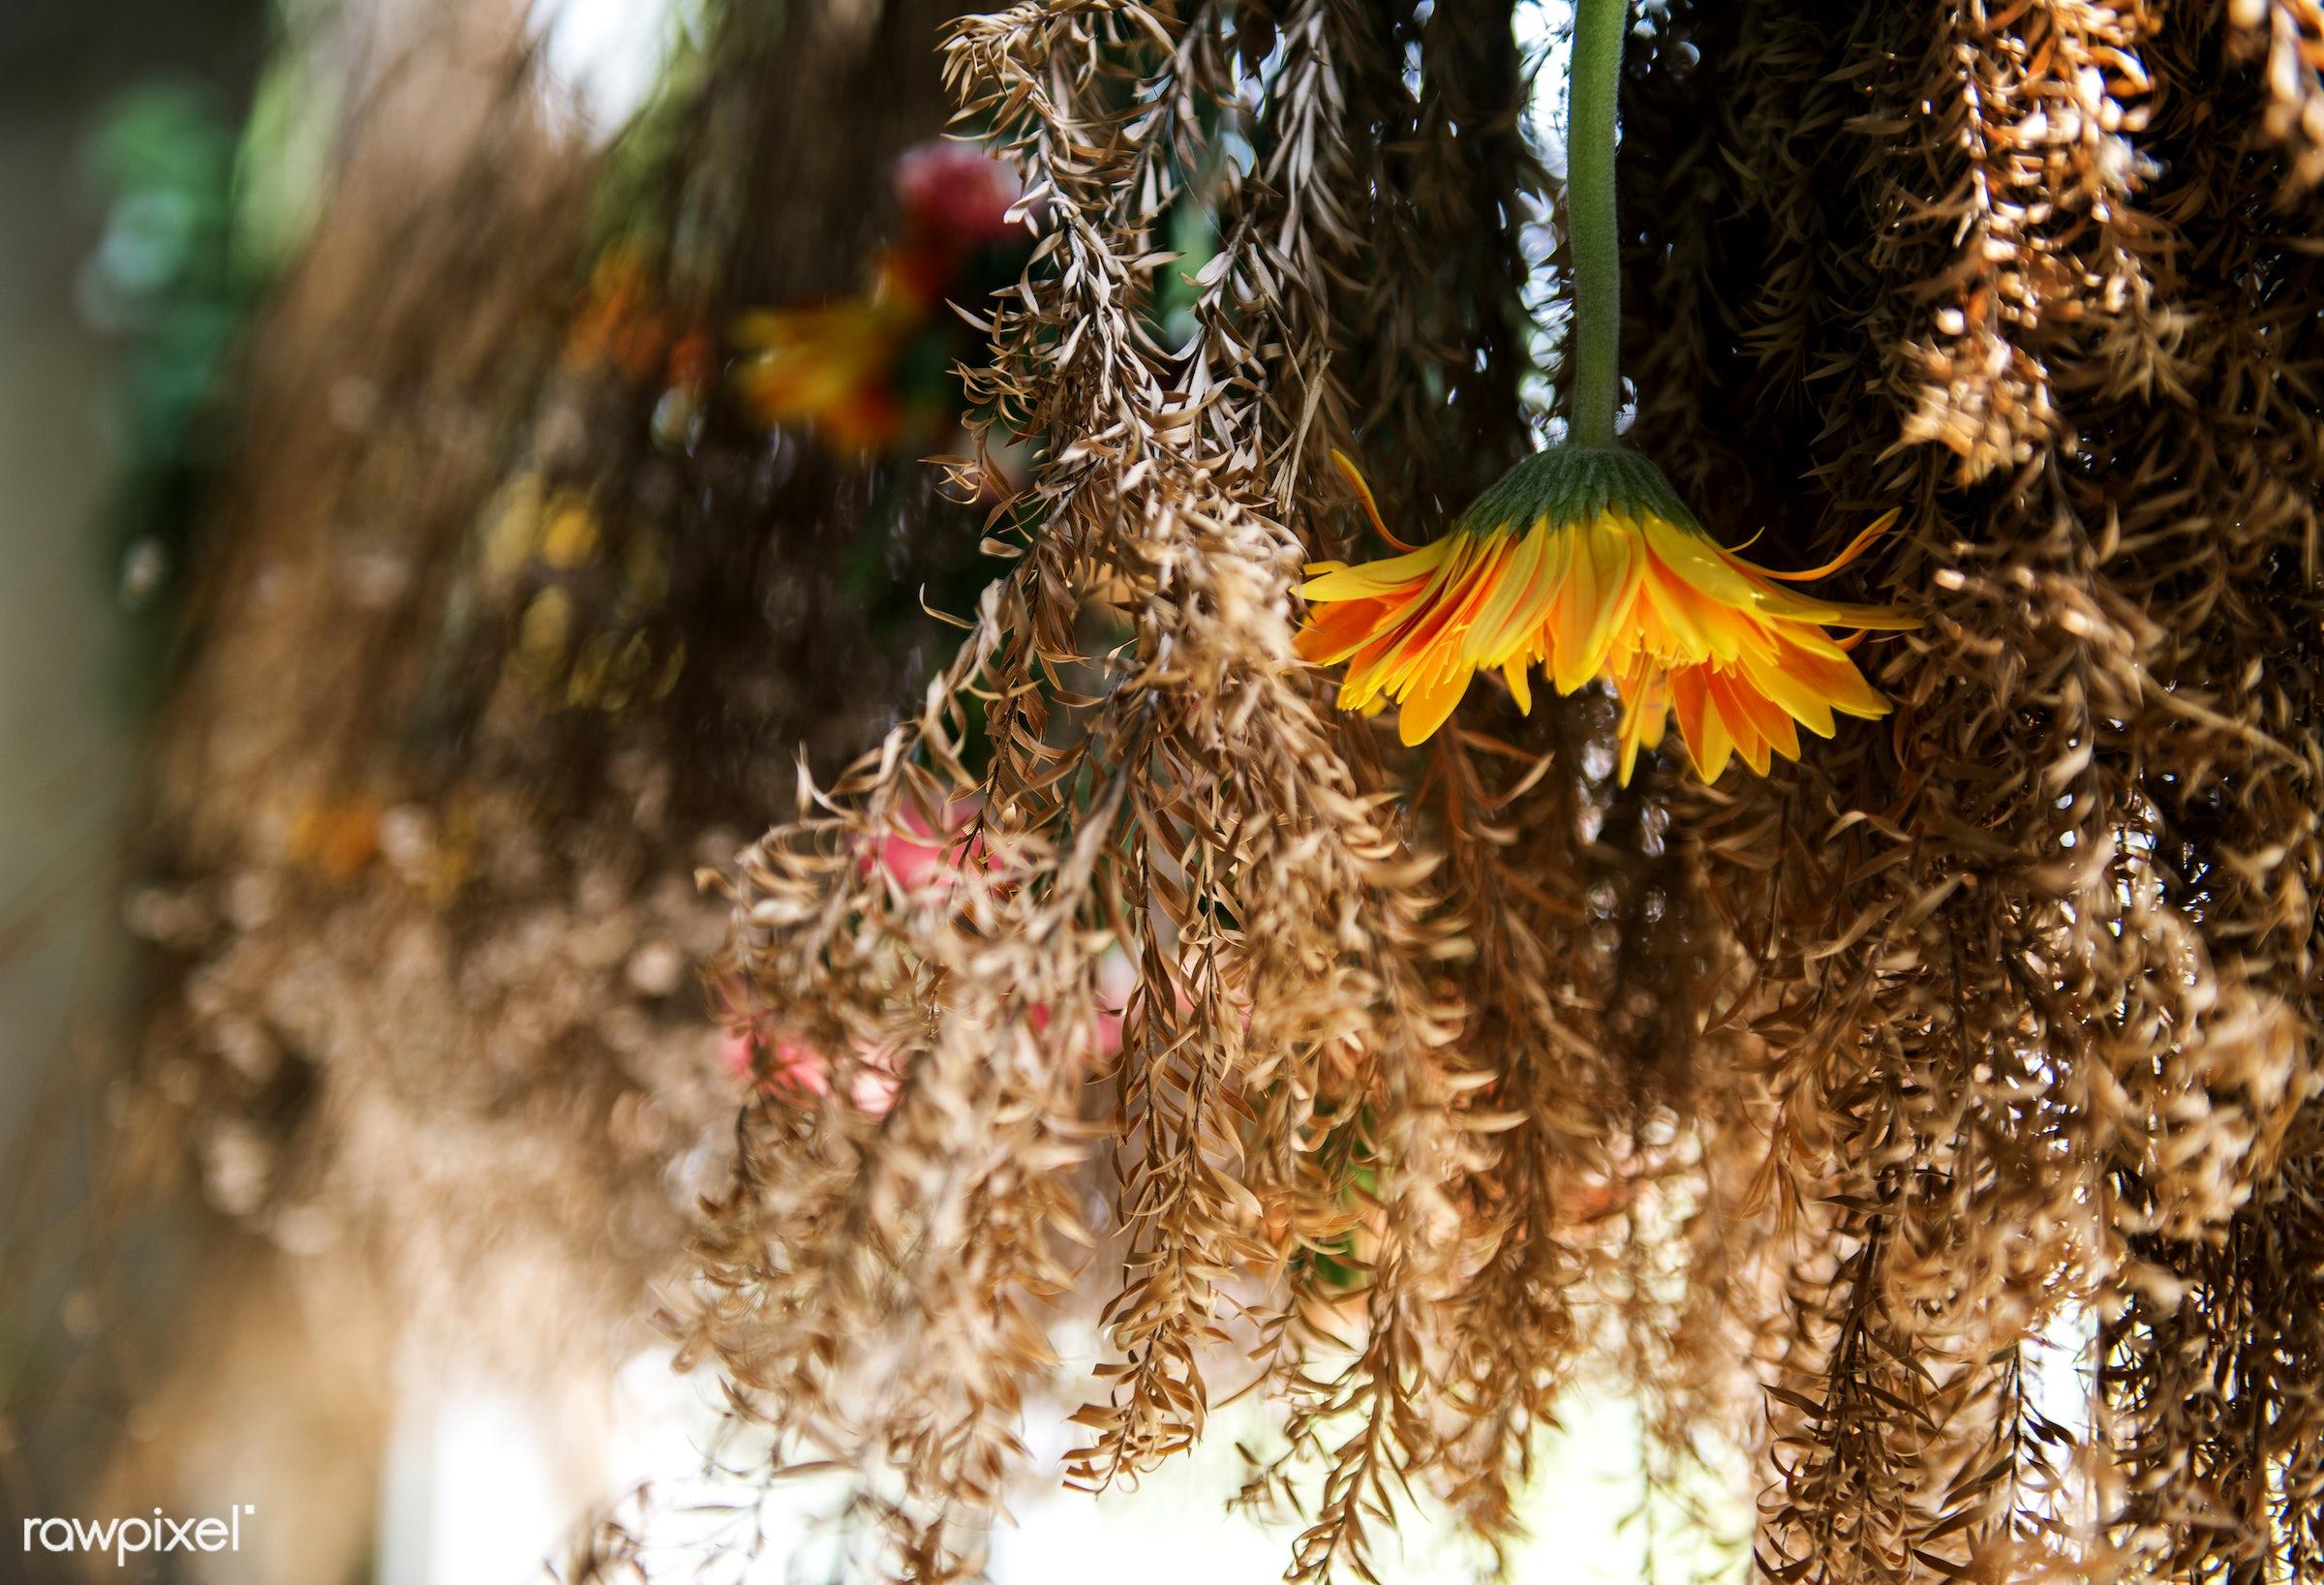 plant, dried flower, dried plant, flora, decoration, refreshment, leisure, florist, hanging, recreational, dried, fresh,...